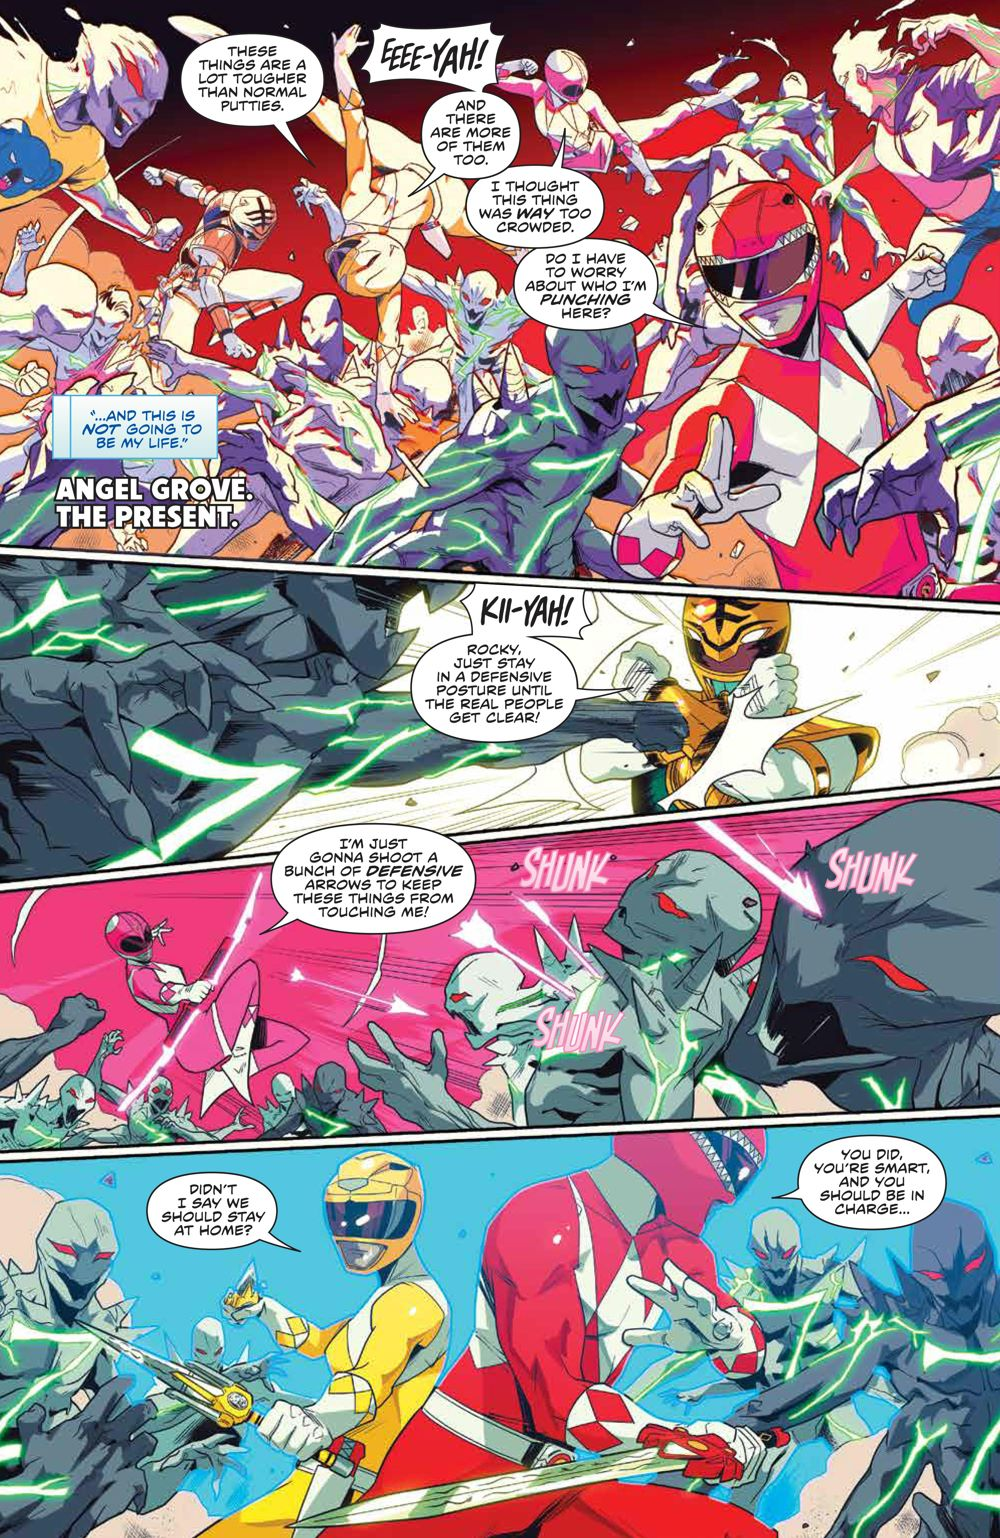 MightyMorphin_003_PRESS_6 ComicList Previews: MIGHTY MORPHIN #3